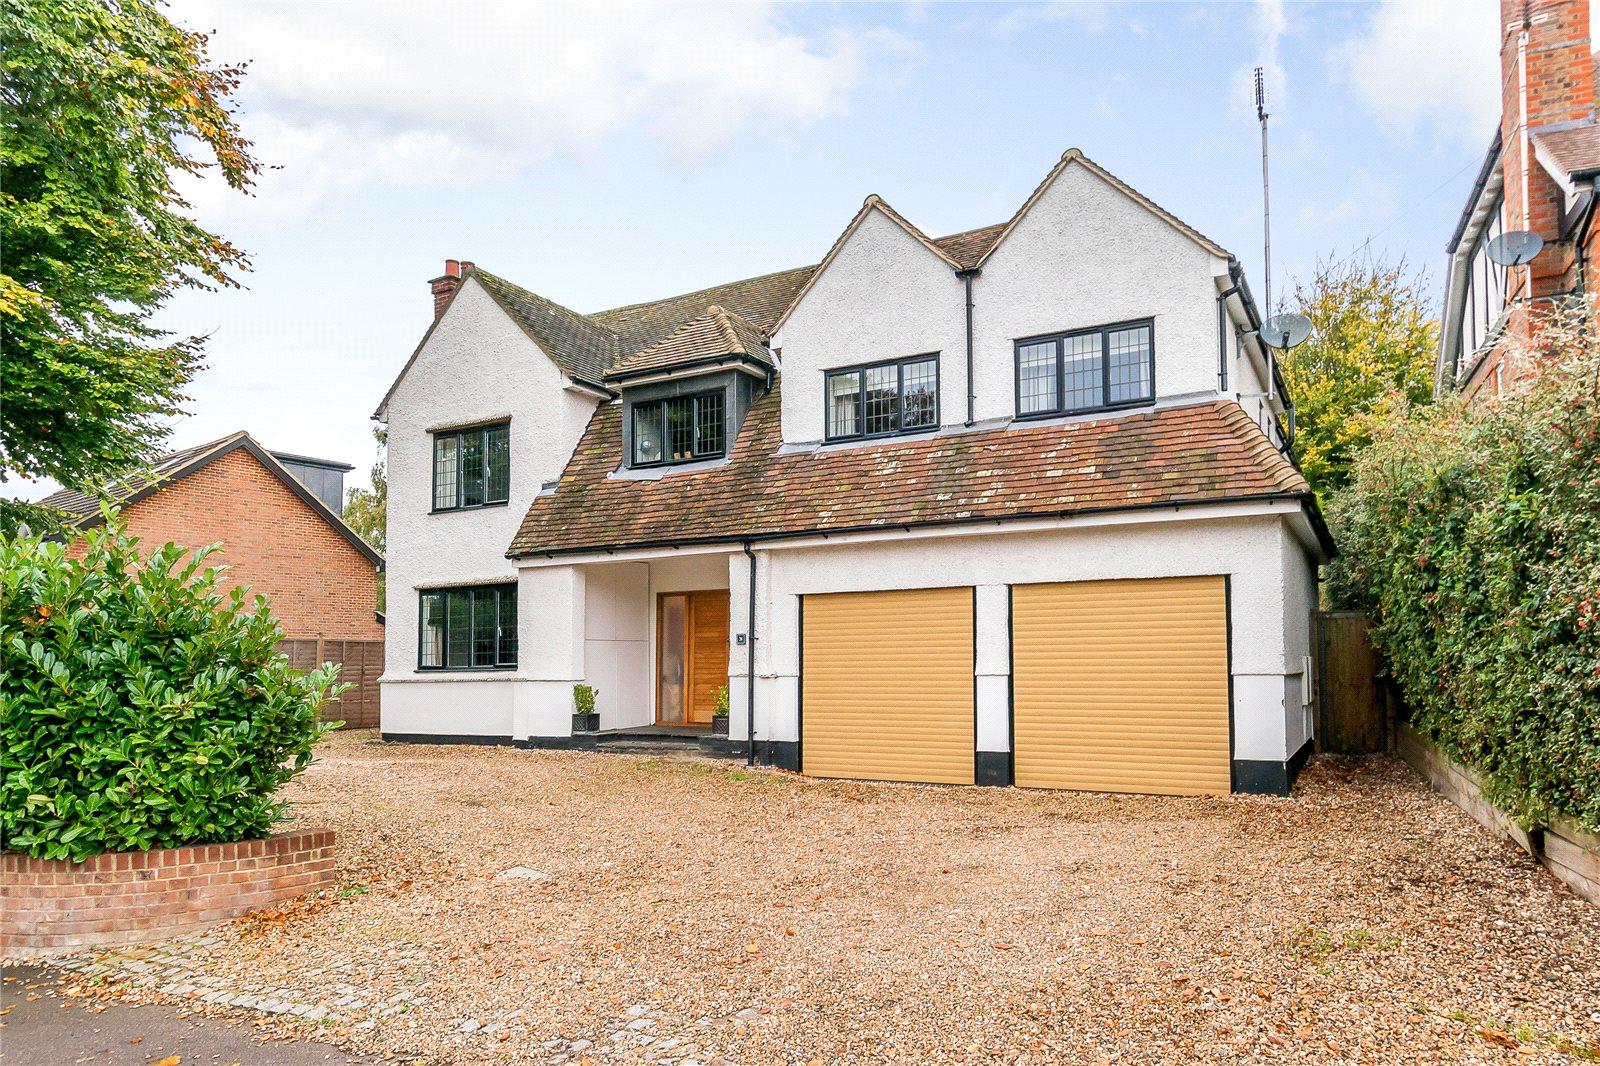 Single Family Home for Sale at Crabtree Lane, Harpenden, Hertfordshire, AL5 Harpenden, England